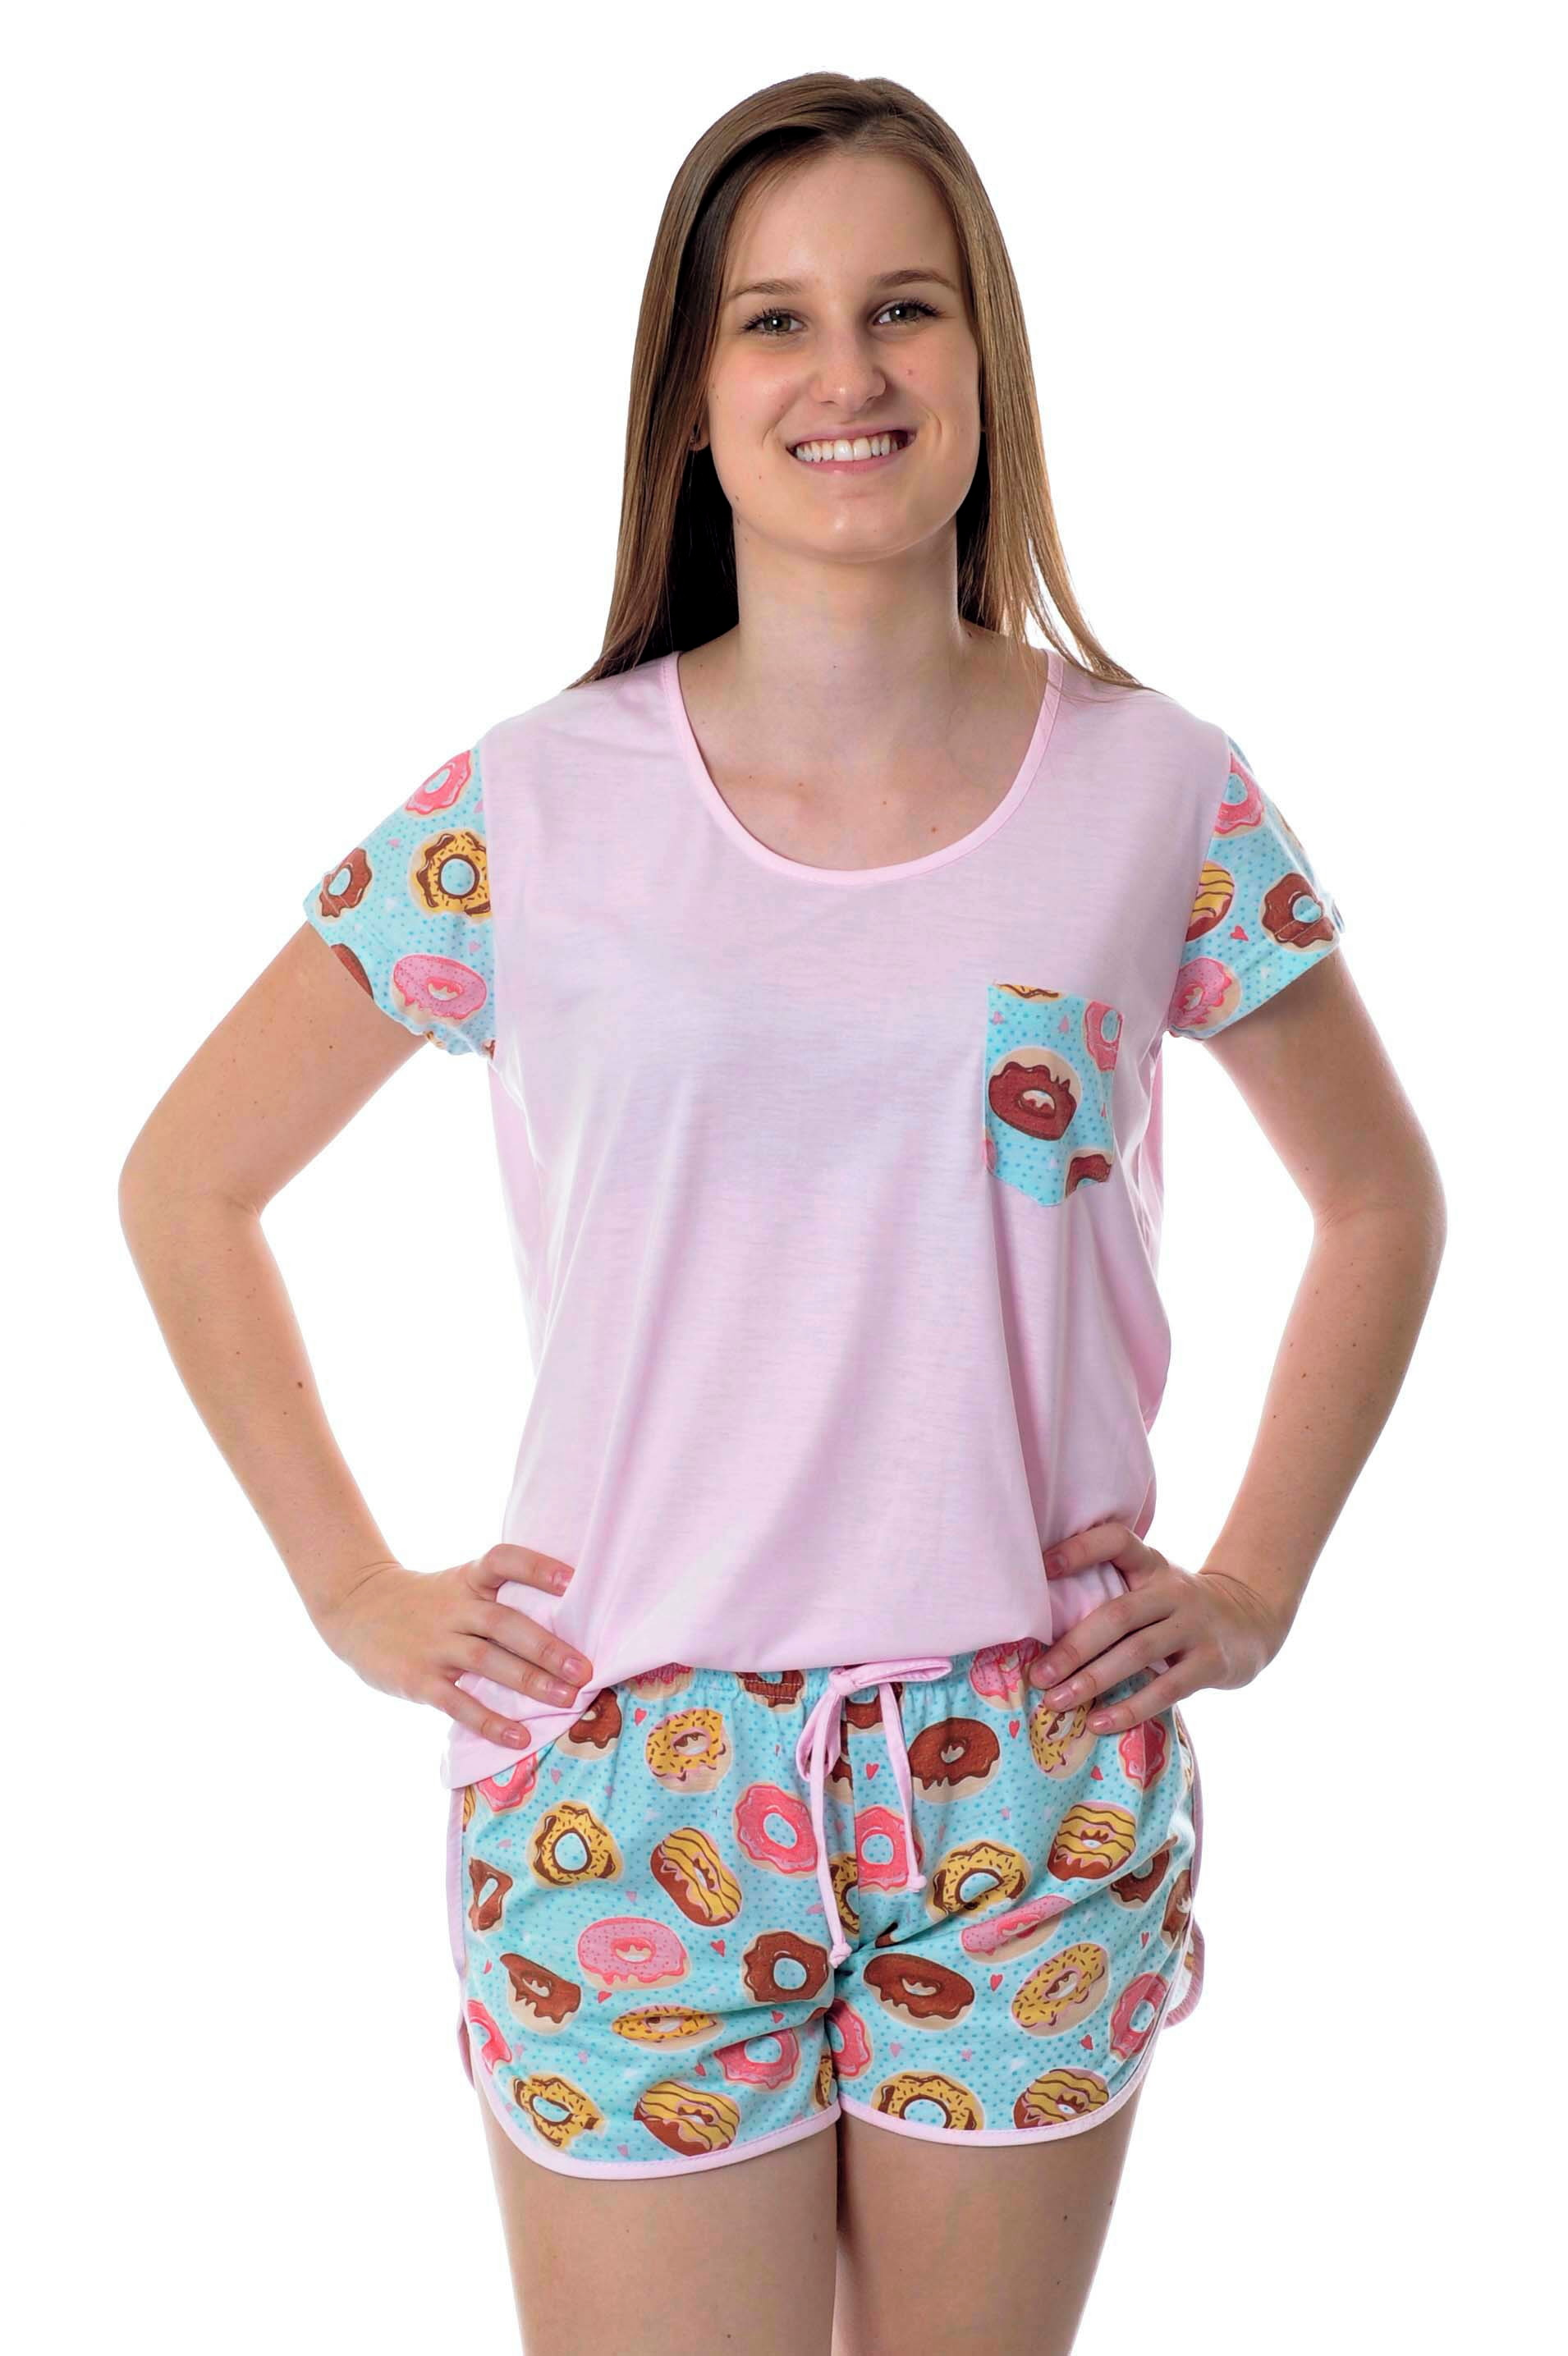 c550fa7613 Pijama Feminino Adulto com Calca Listrada